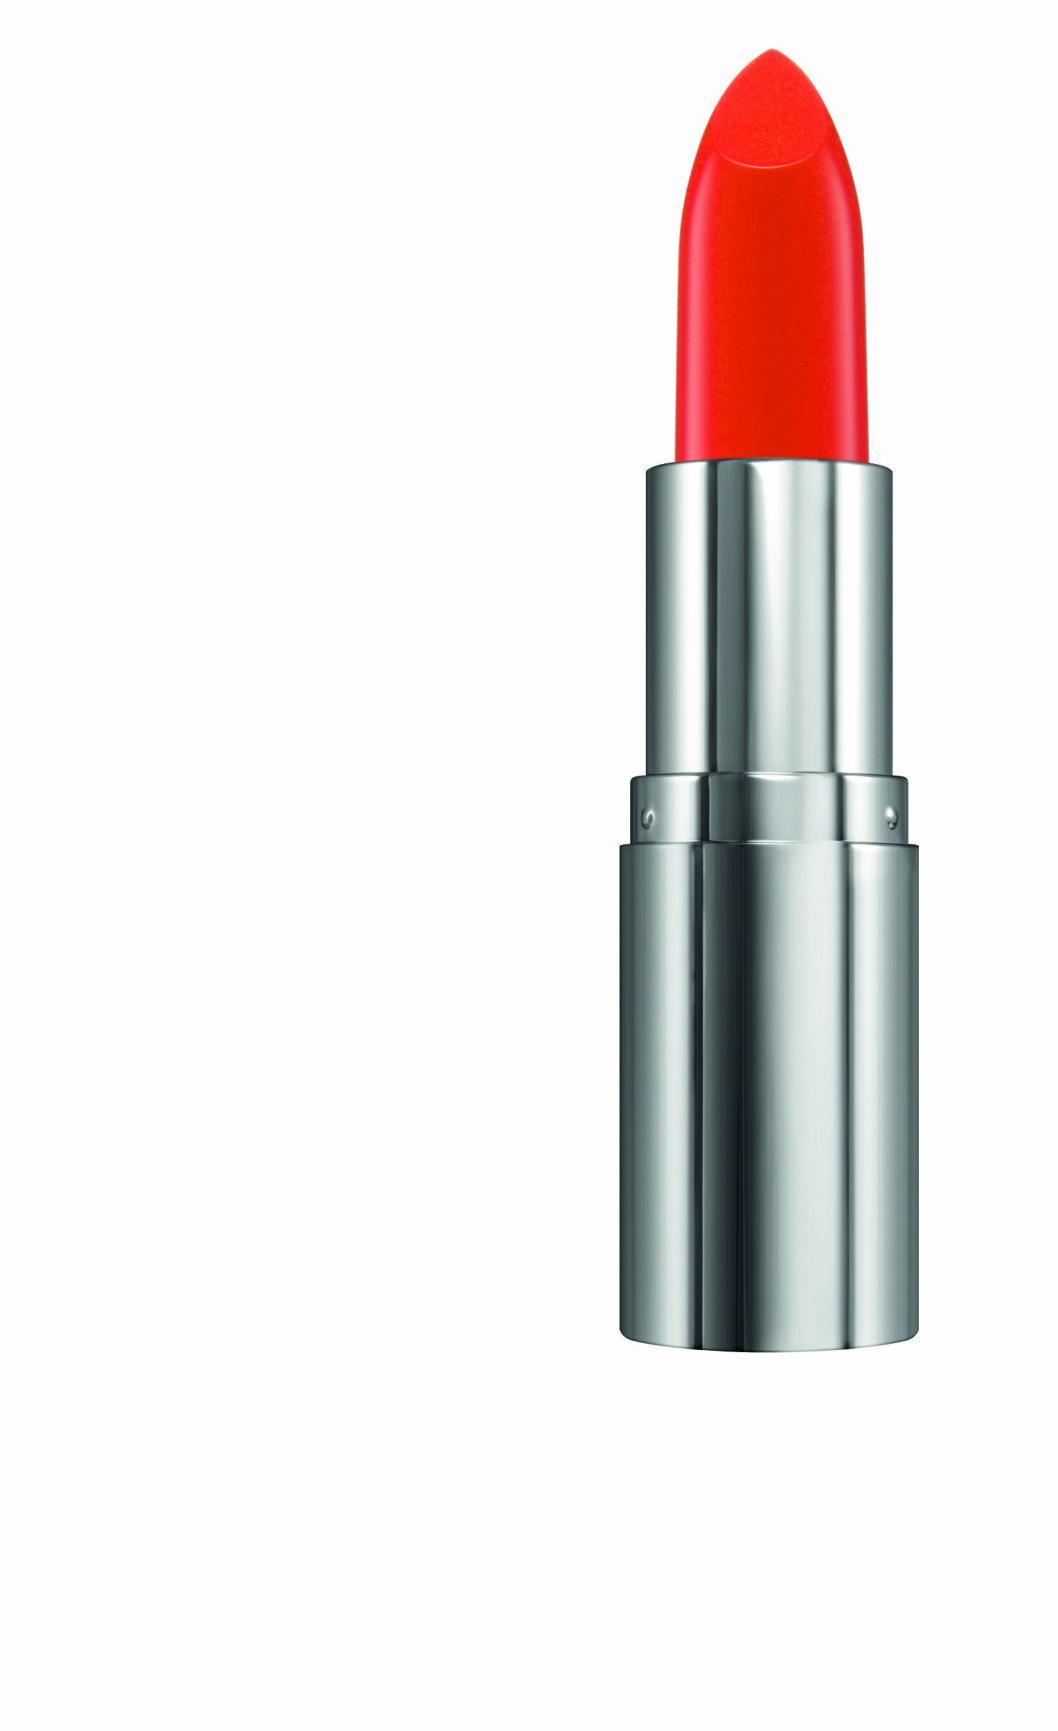 Colour Crush Matte Lipstick i fargen Coral Blush fra The Body Shop, kr 139. Foto: Produsenten